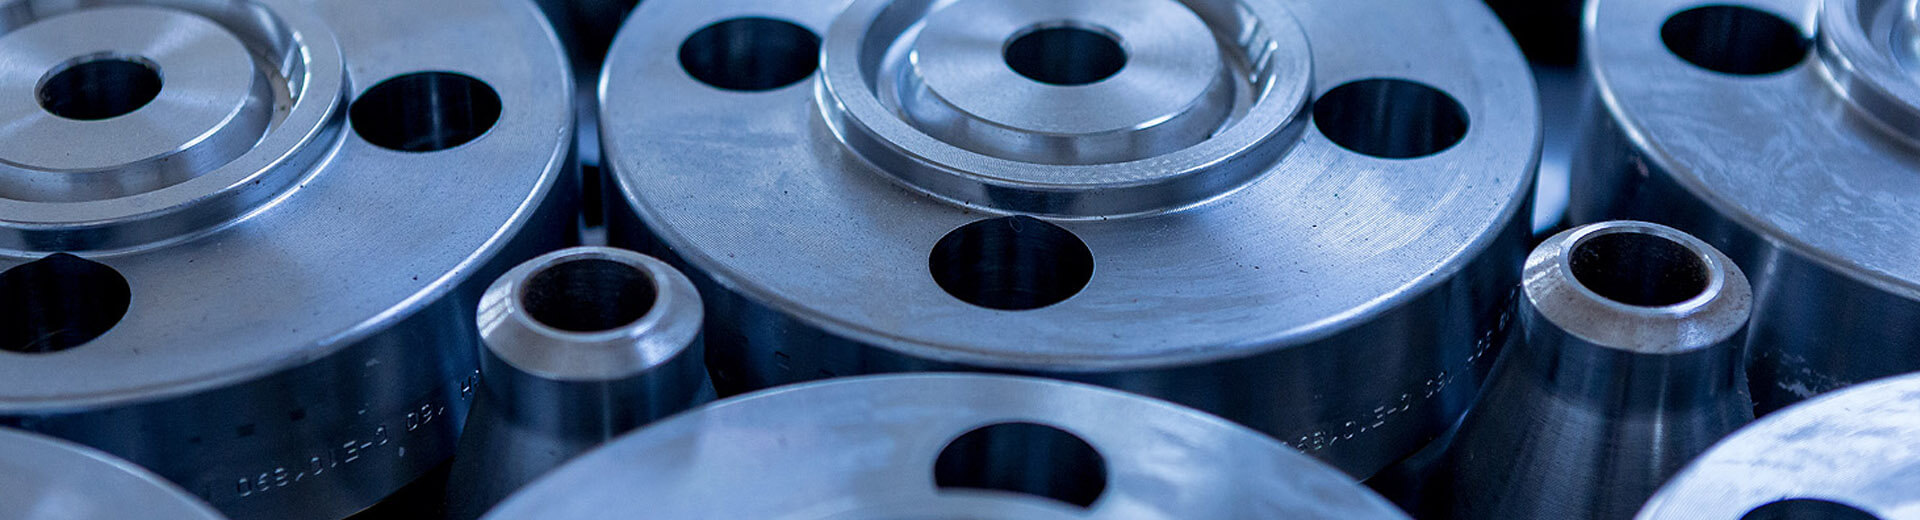 Steeltrade-flange-in-acciaio2